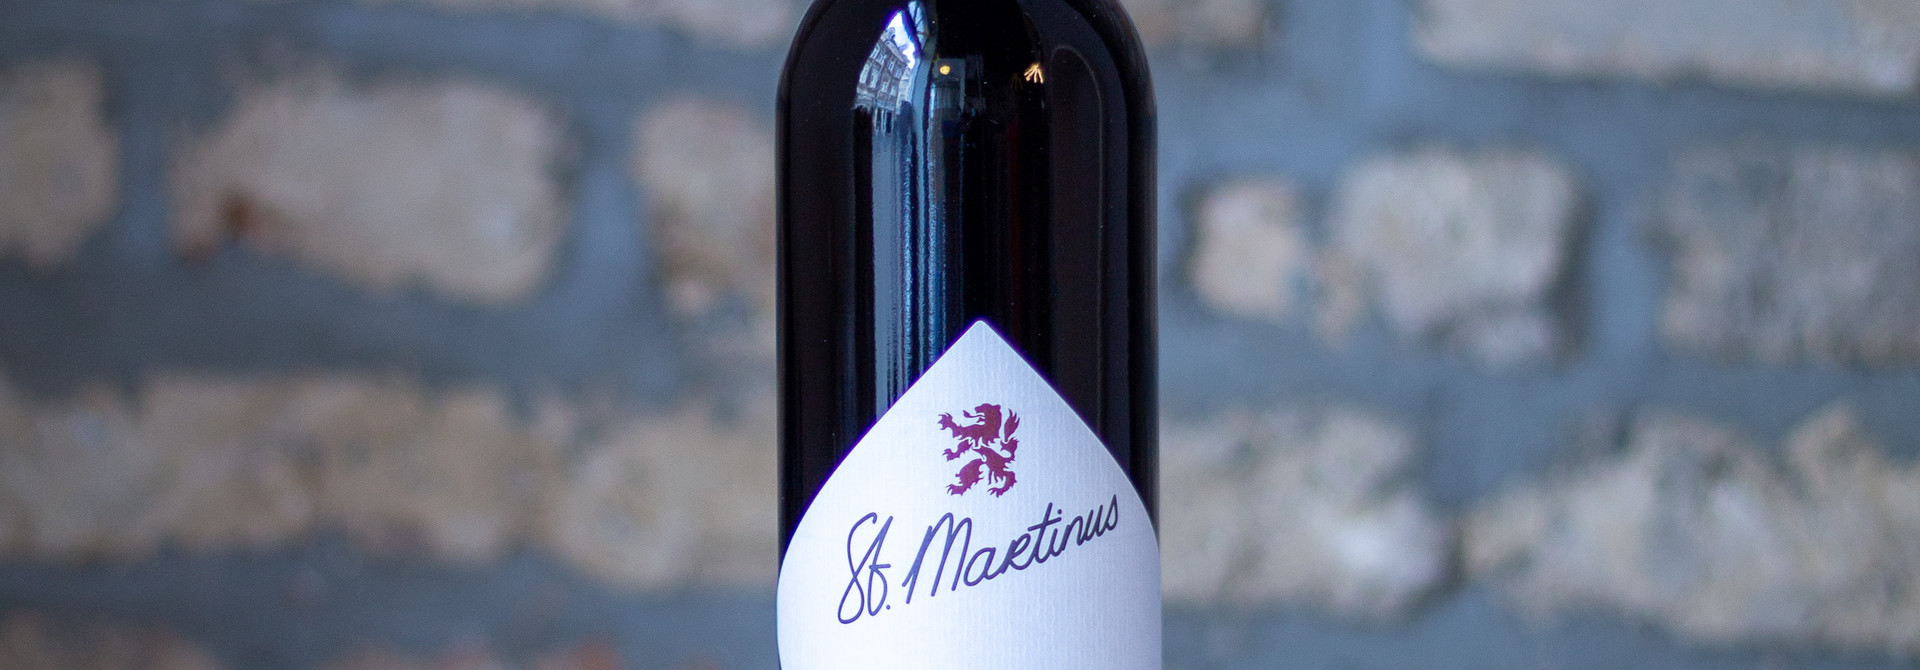 St. Martinus Cuvée Patriek